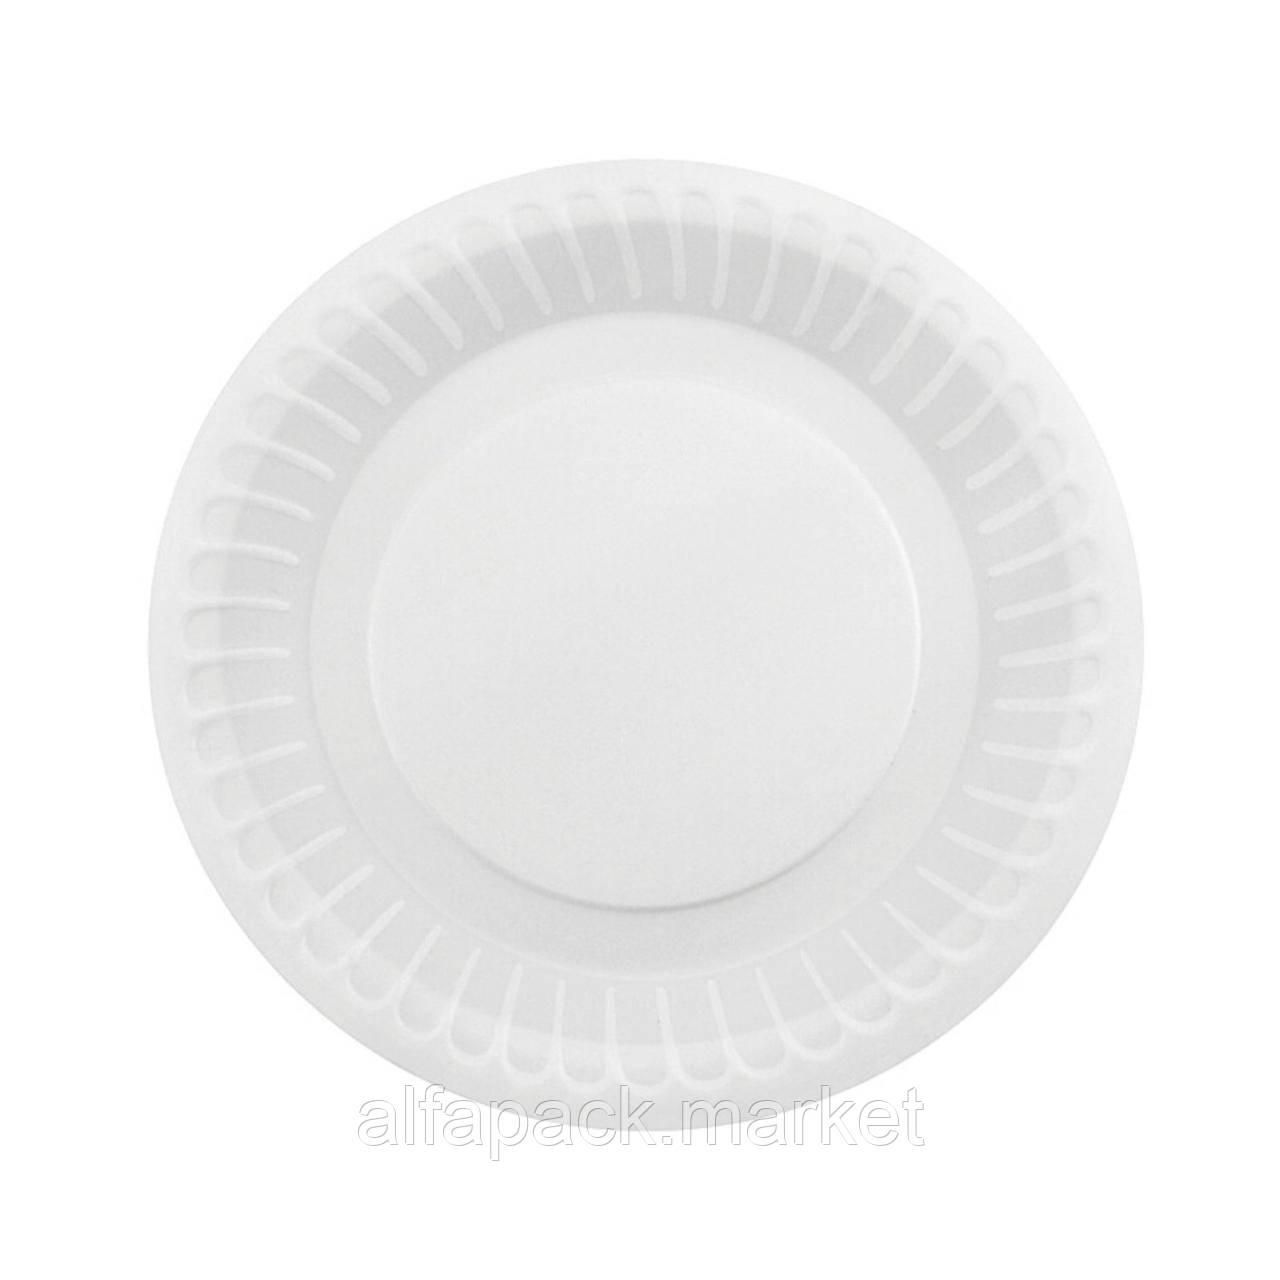 Набір одноразових тарілок Food Packing Тарілка банкетна 225мм 25 персон 000002427